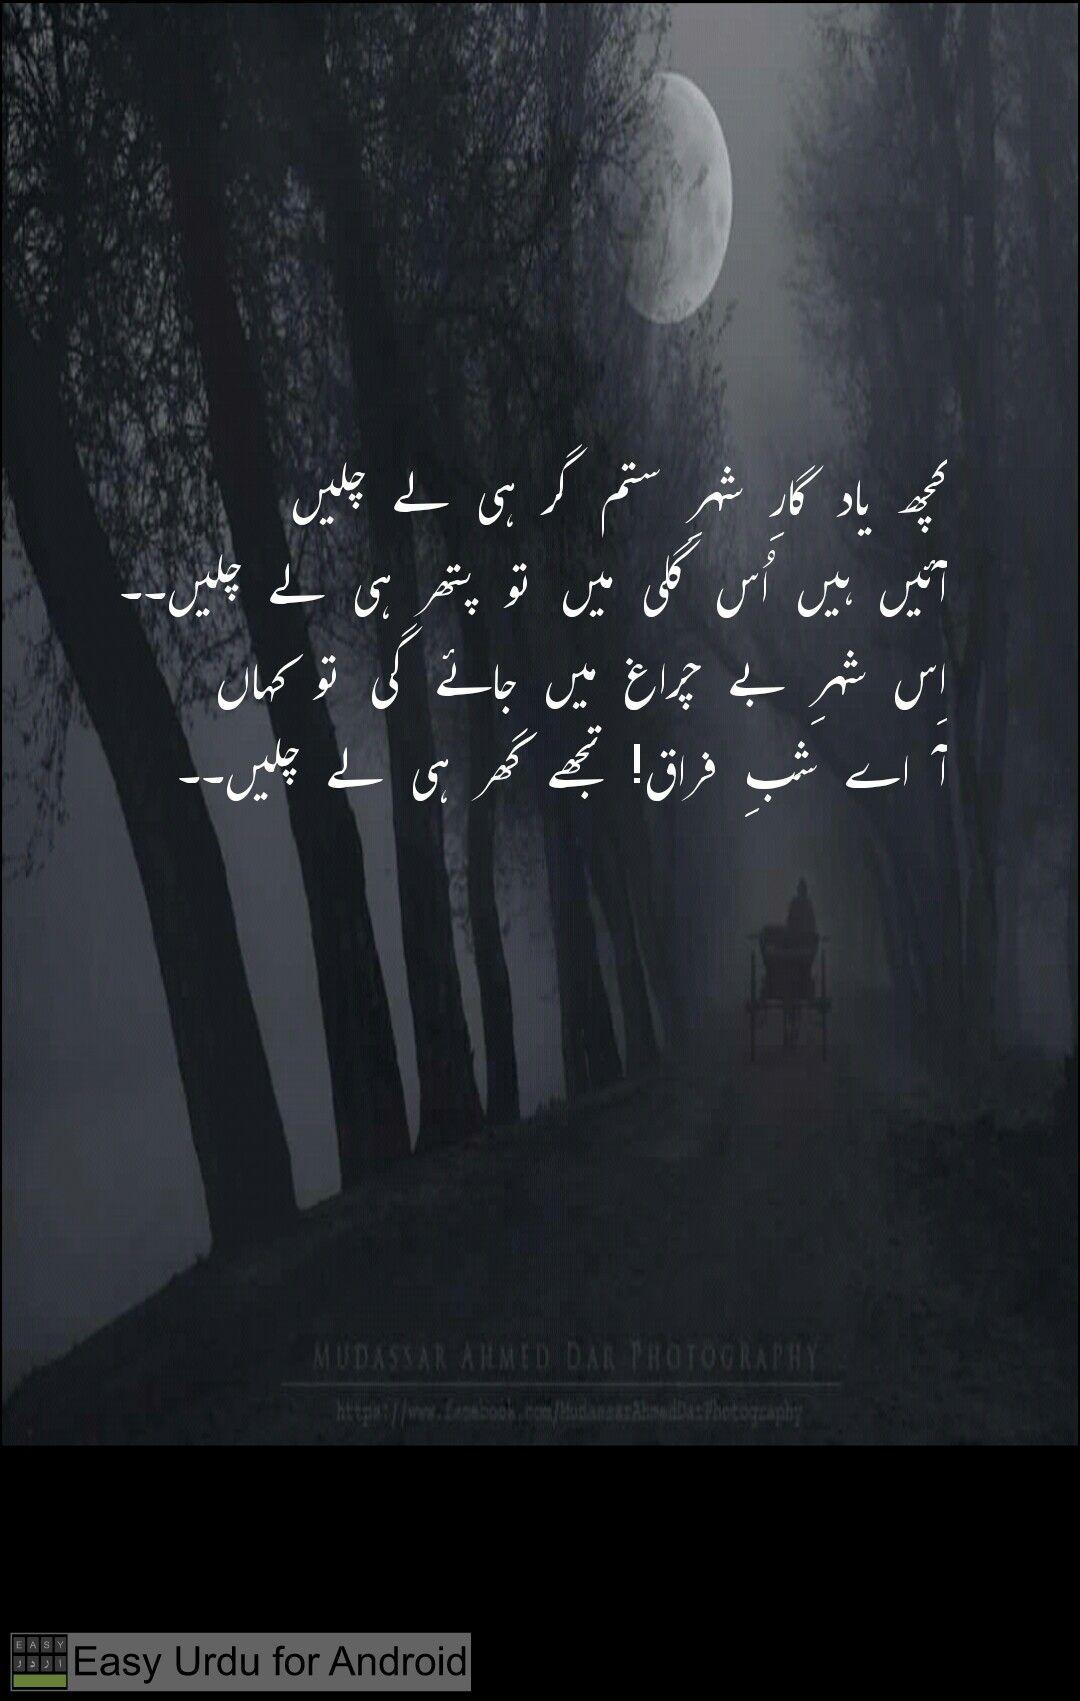 Good Night Poetry In Urdu Pics : night, poetry, Humaira, AWAISI💓, NIGHT, Poetry, Quotes,, Poetry,